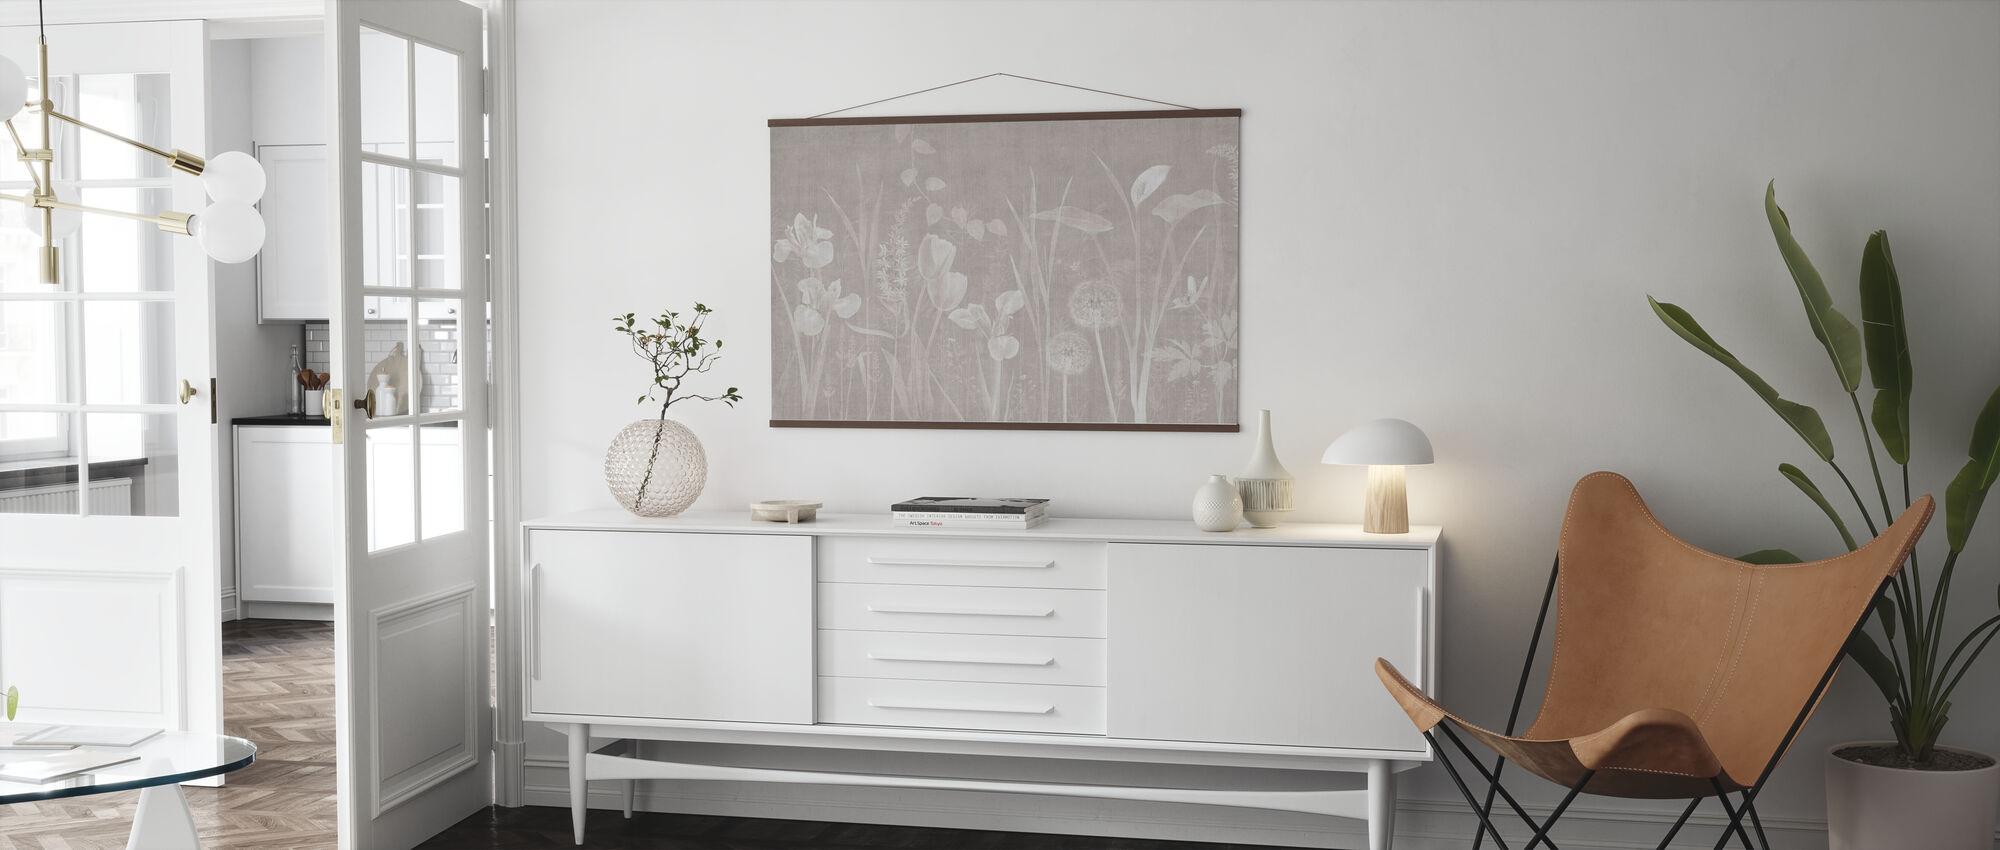 Dandelion Field - Ash Hazel - Poster - Living Room